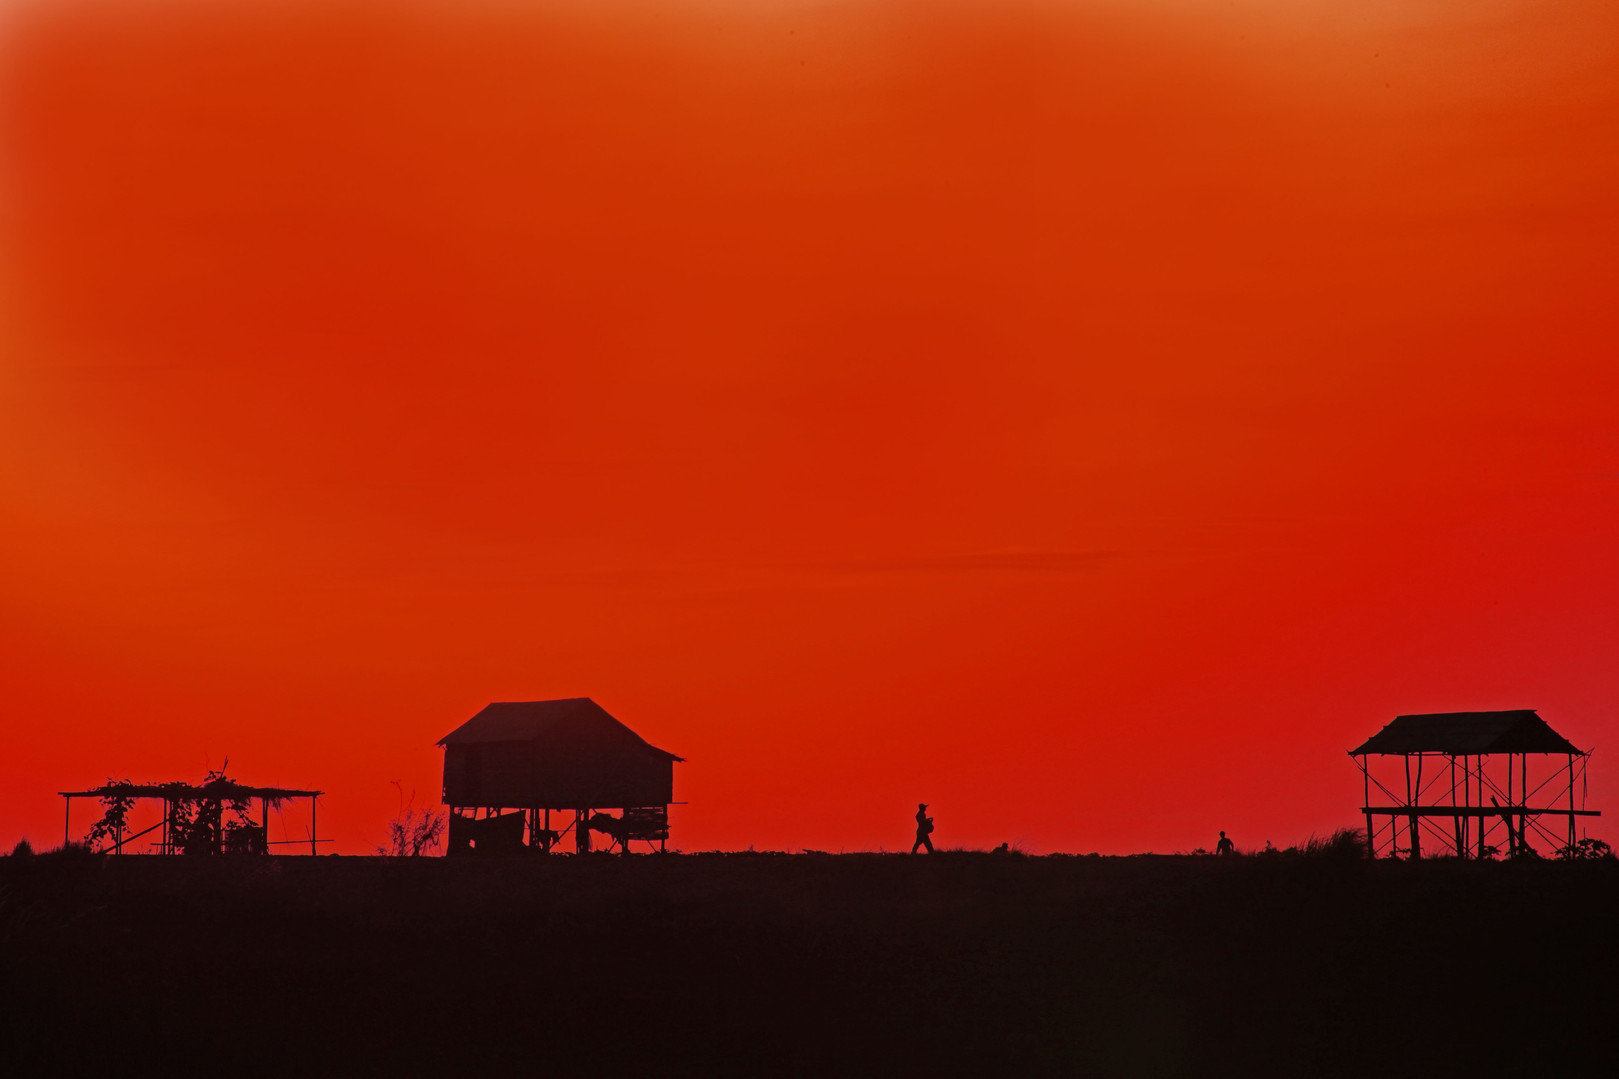 Christopher_de_Doby_Cambodia.JPG